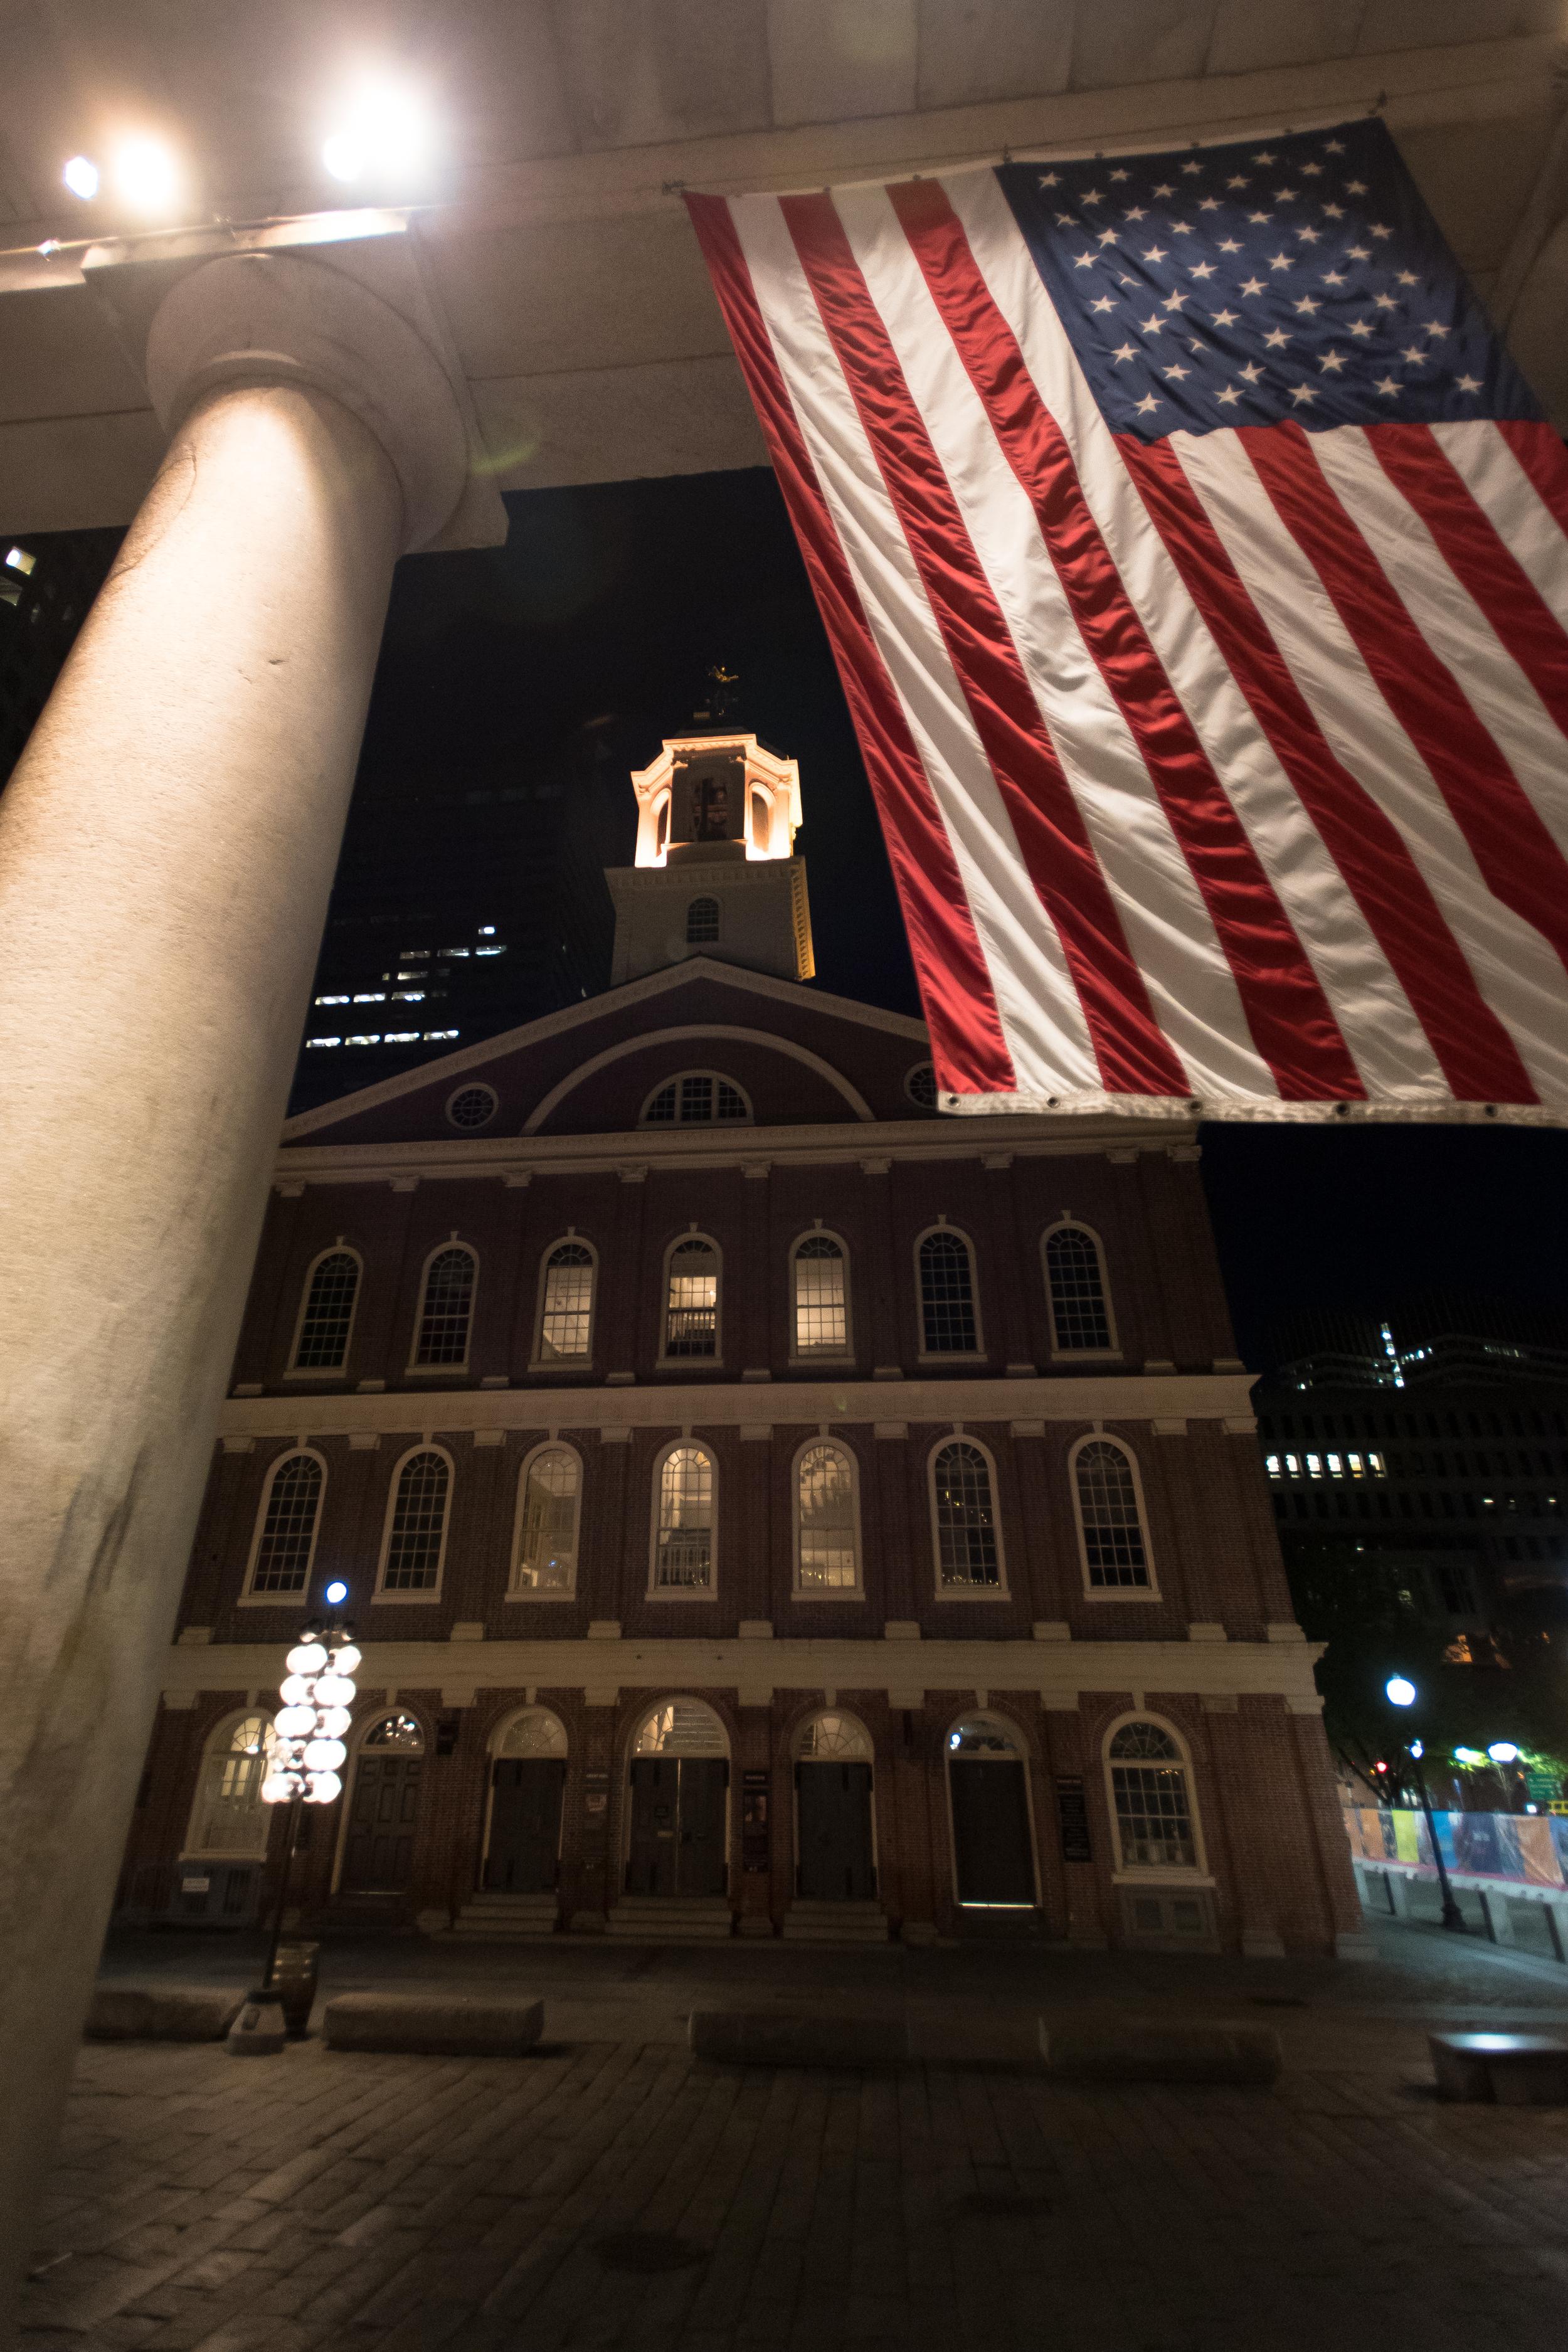 Patriots - Faneuil Hall (Boston, USA)